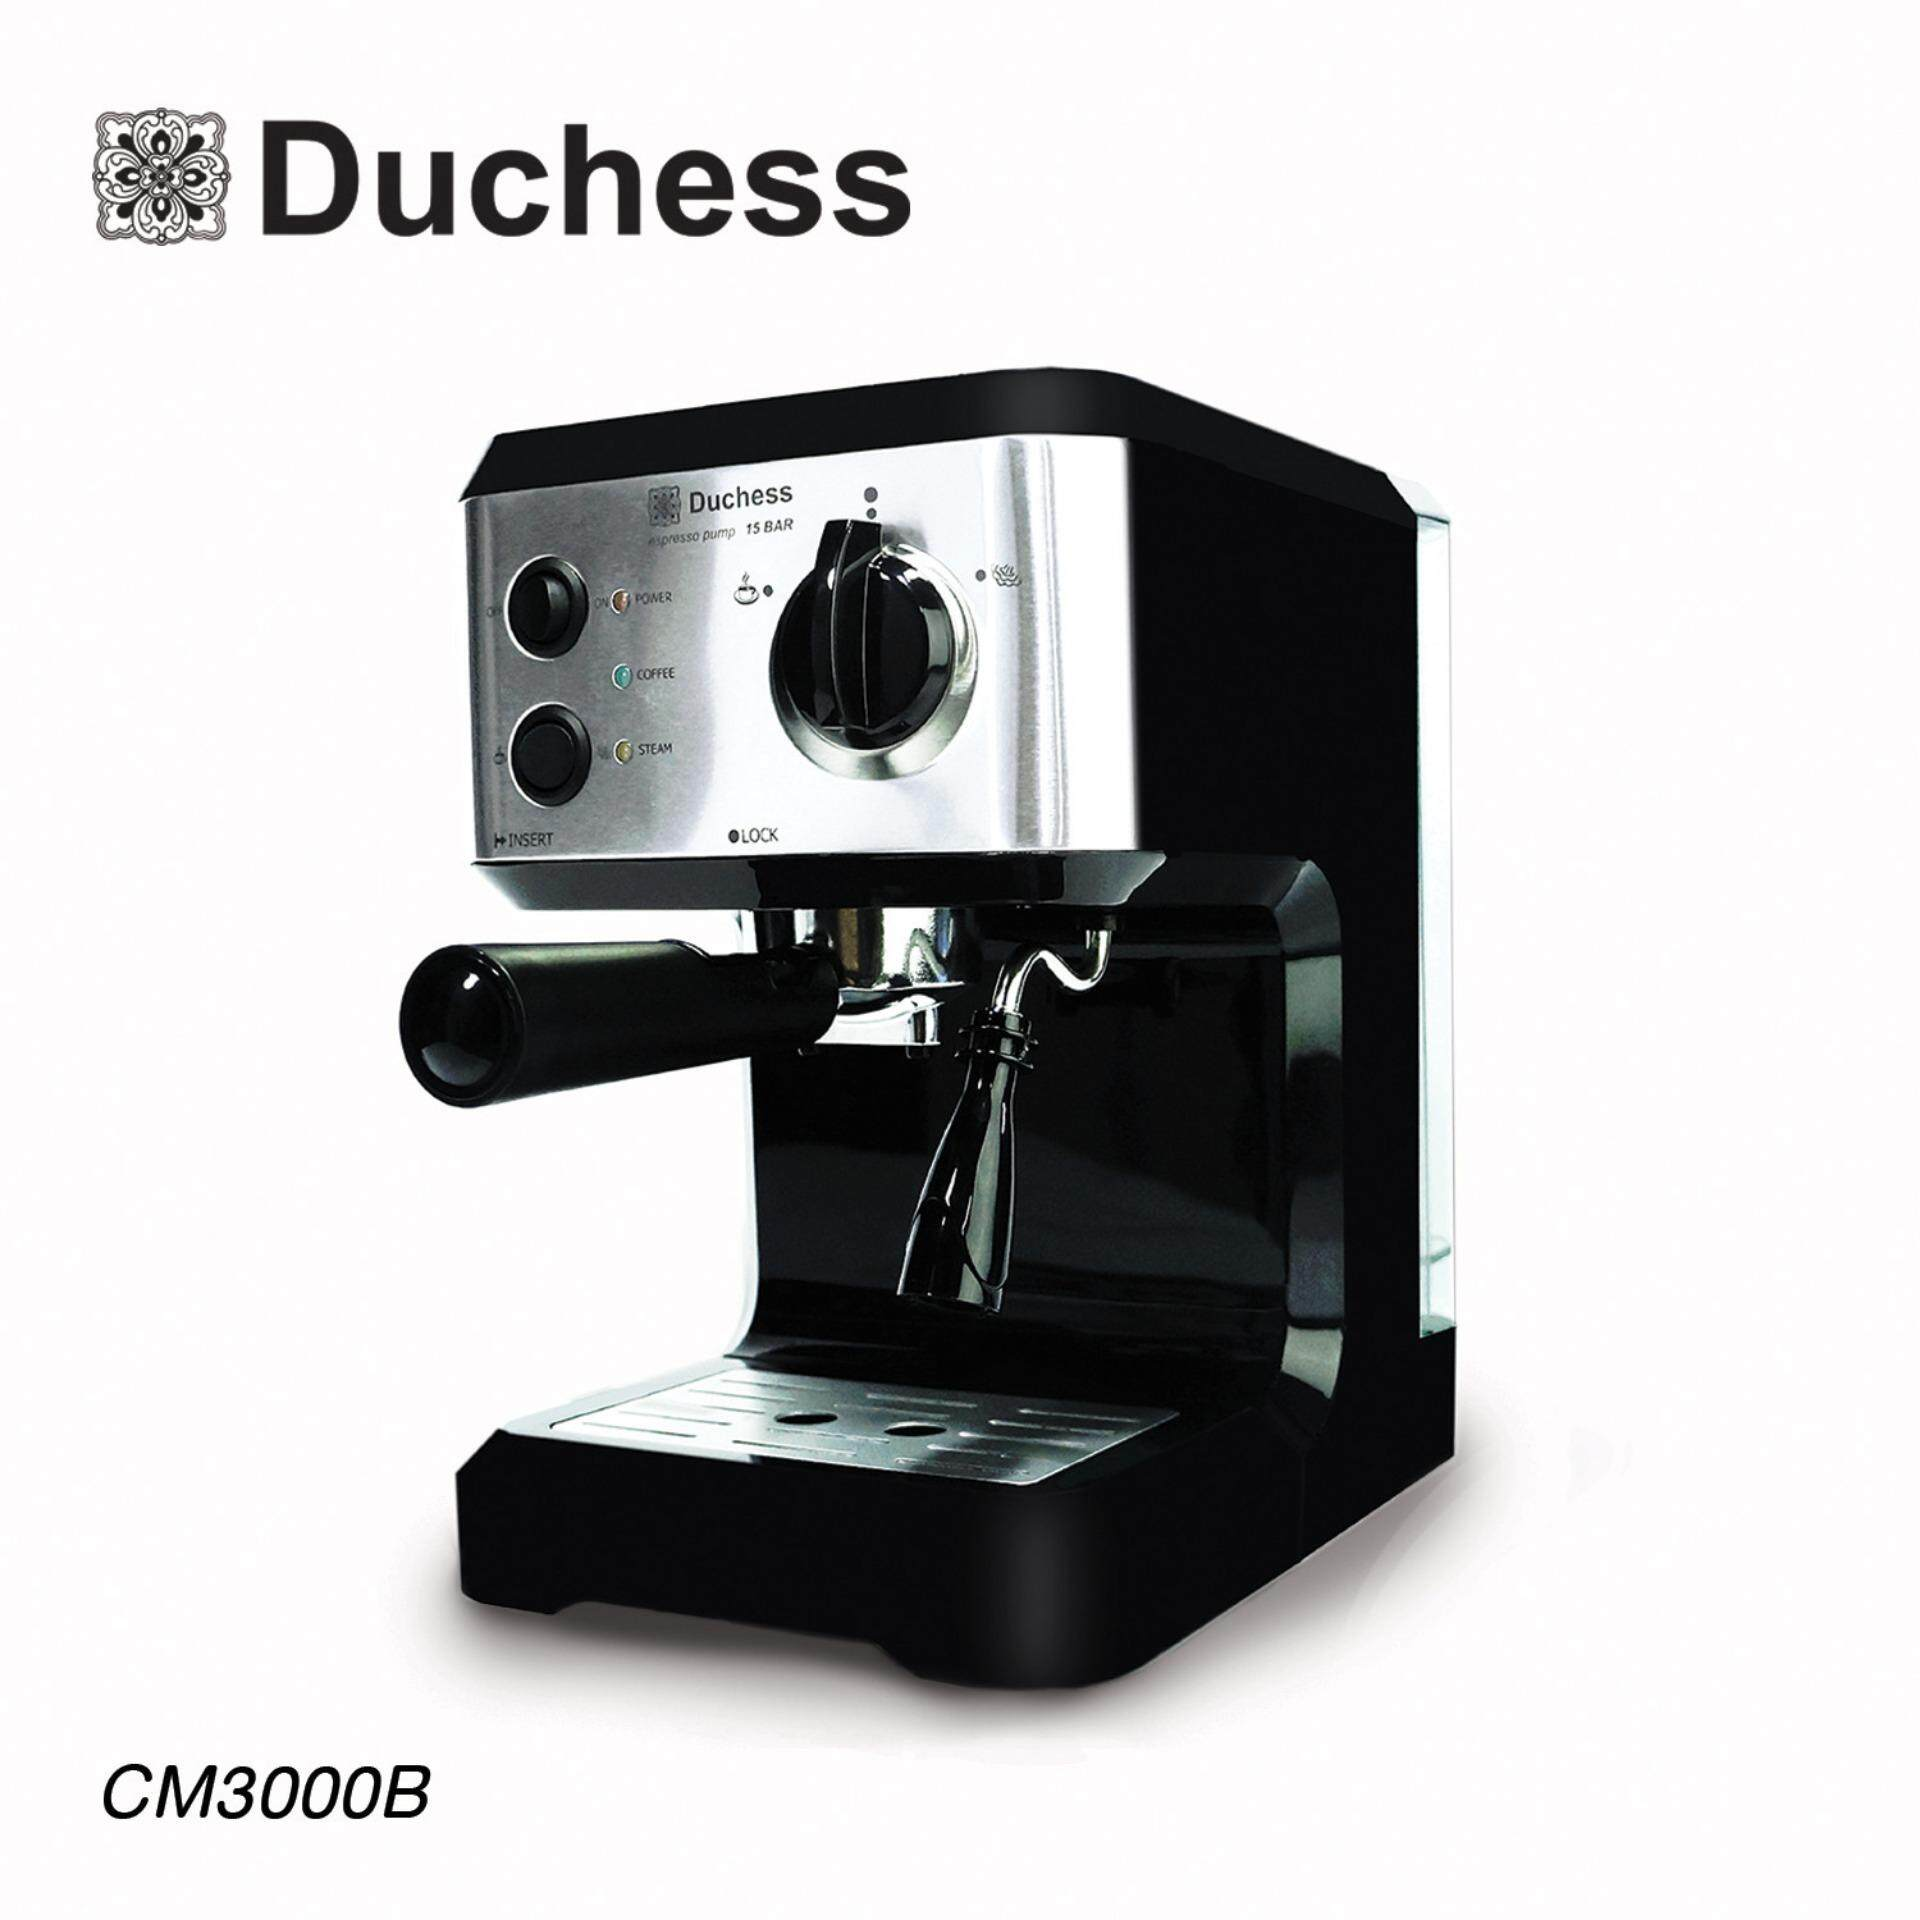 Duchess เครื่องชงกาแฟสด รุ่น CM3000B